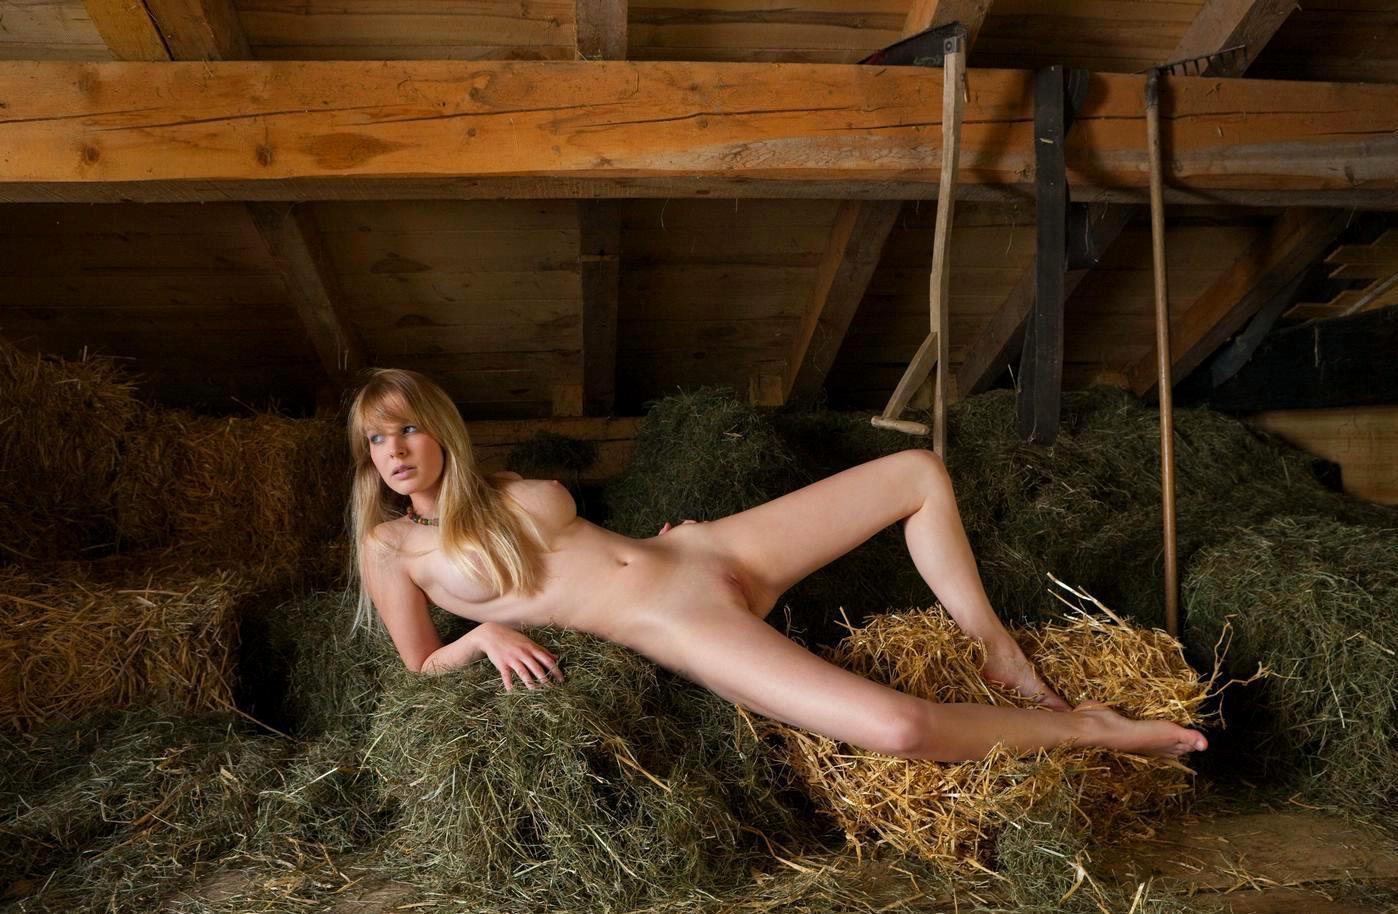 Эро фото секс на ферме фото 22 фотография